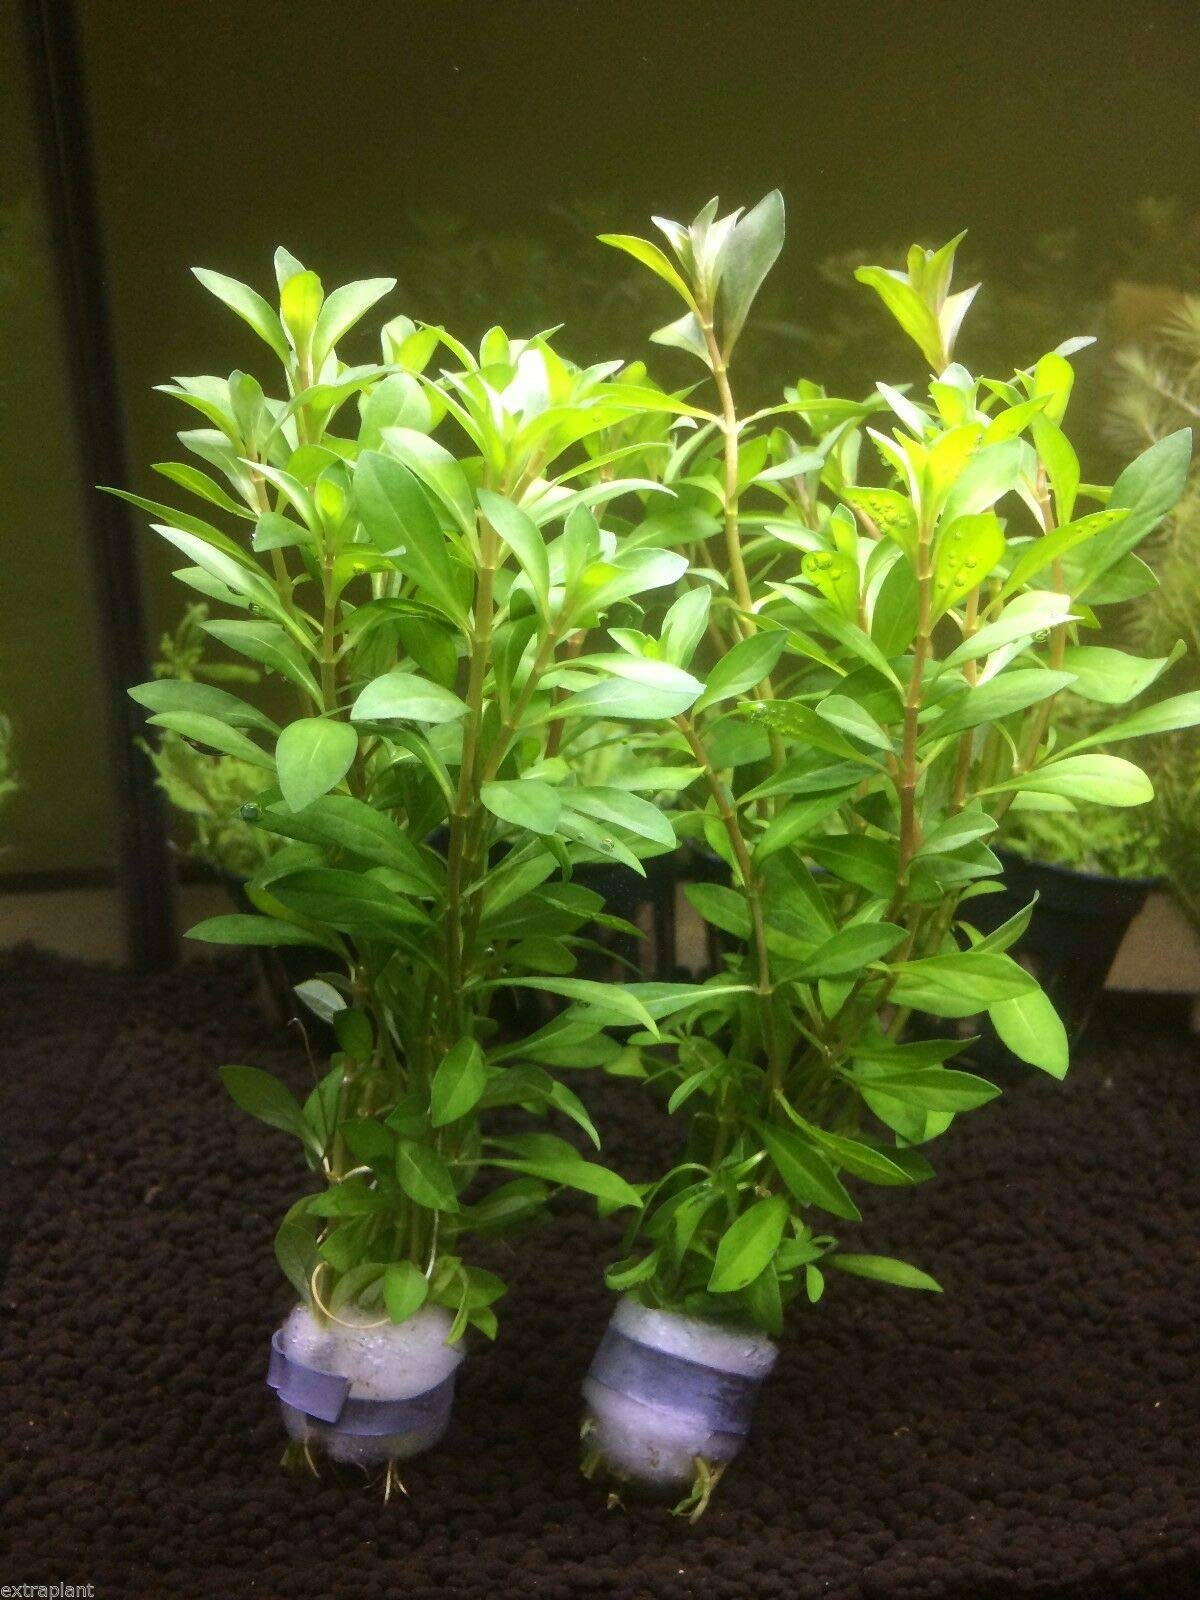 3X Ludwigia Arcuata Bunch Repens Needle Leaf Live Fresh Aquarium Plants Factory by SS0156